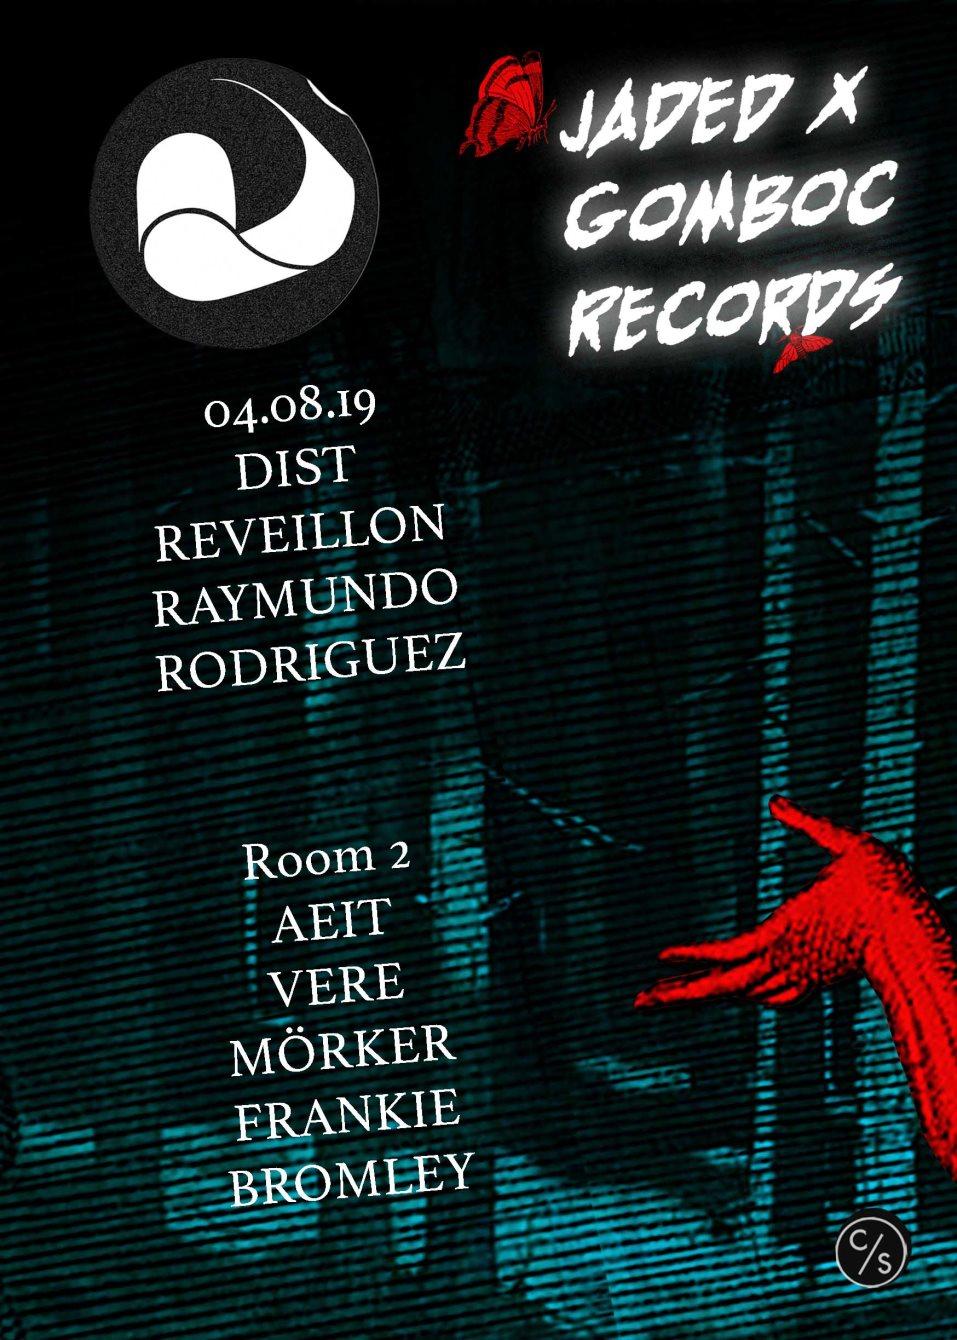 Jaded x Gomboc Records: Reveillon & Dist - Flyer back